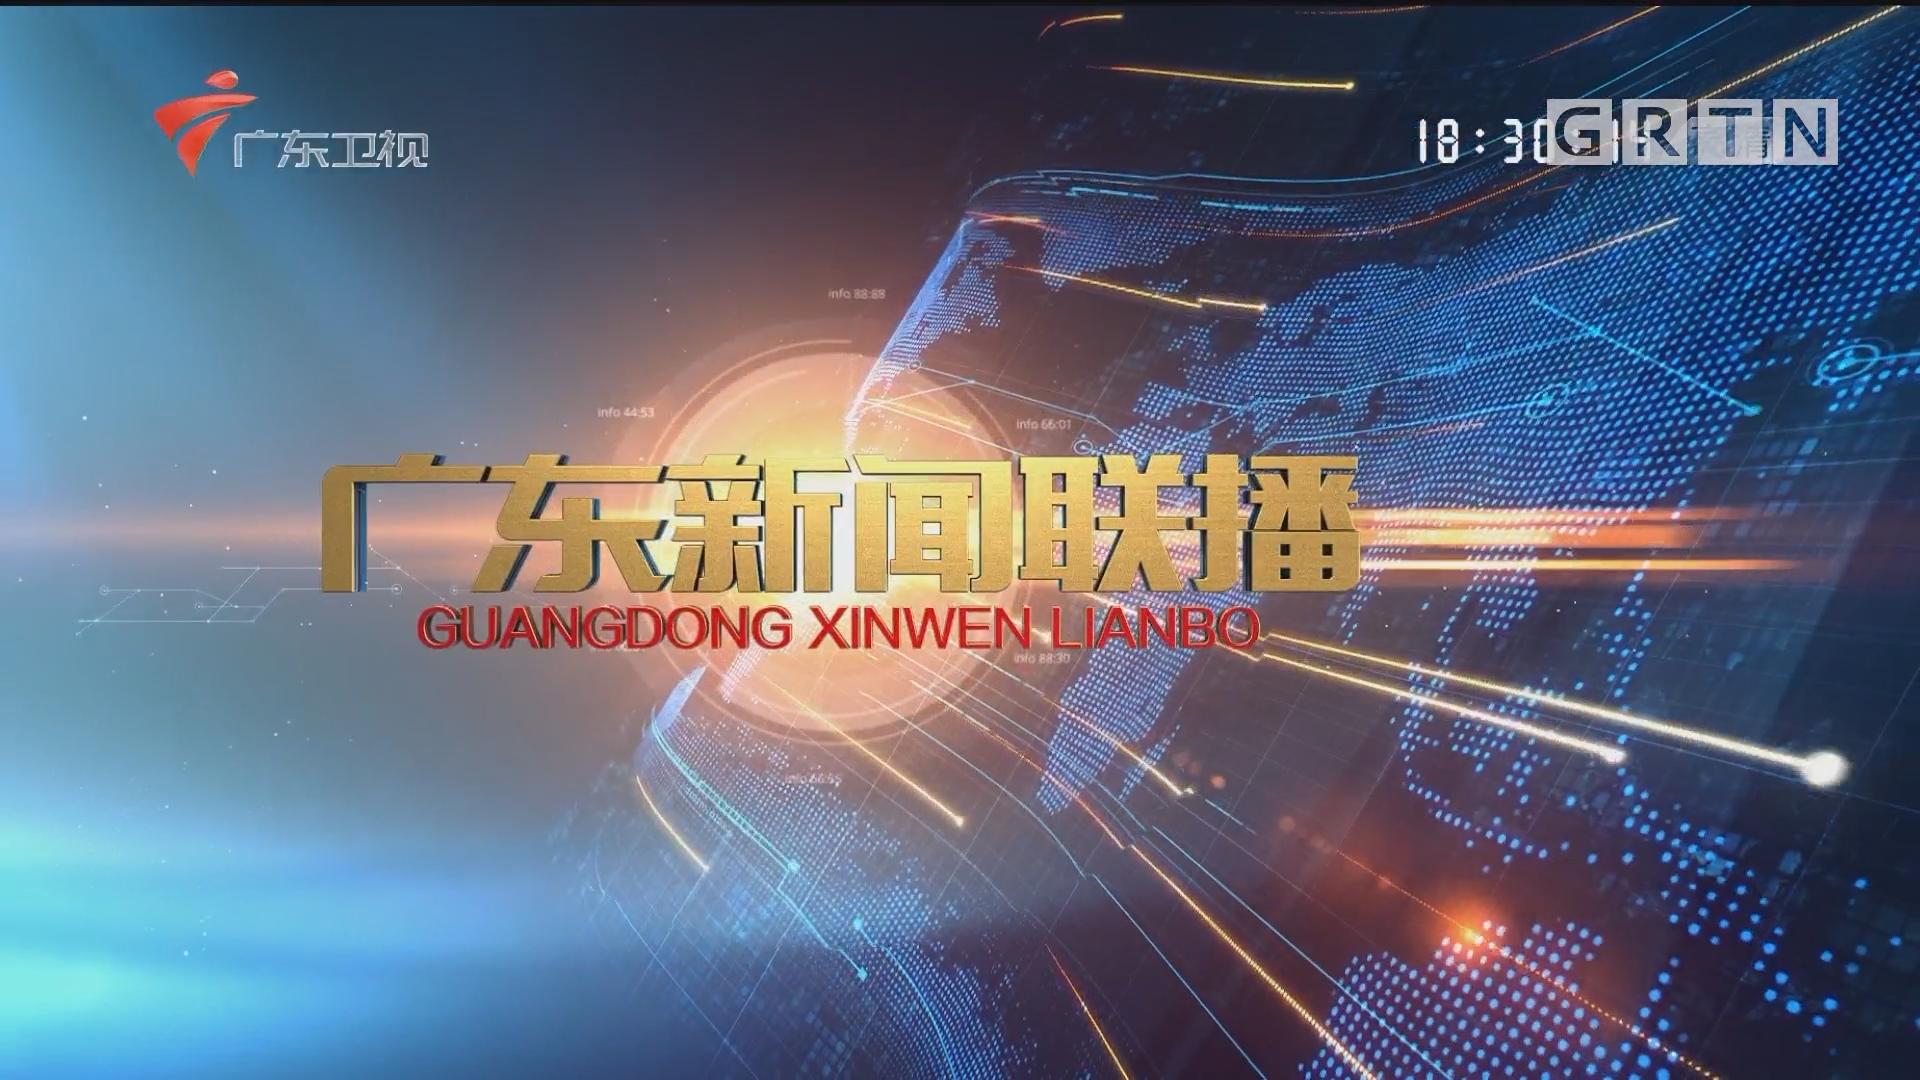 [HD][2017-10-10]广东新闻联播:广州东濠涌:多举并行 水清又明